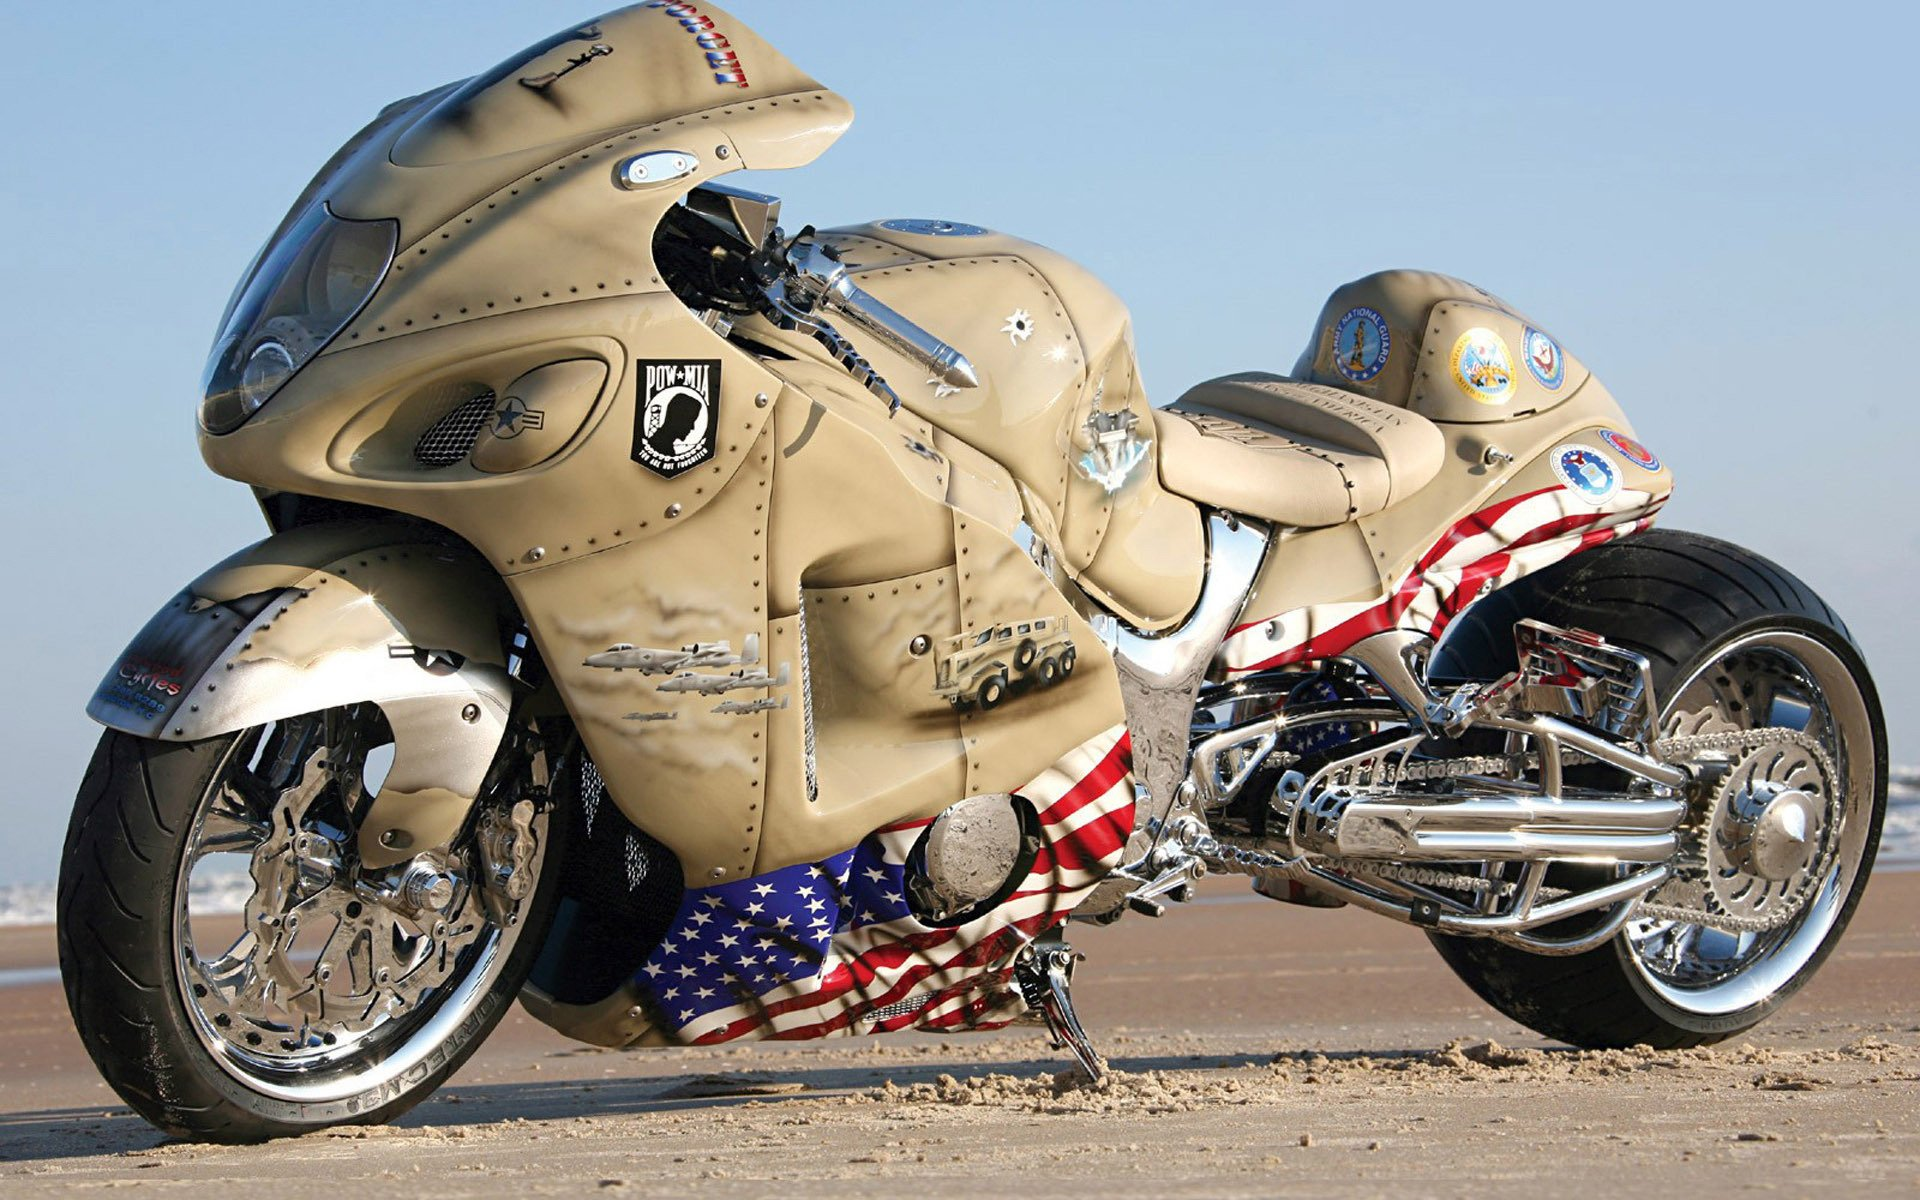 suzuki motocross bike hd - photo #26